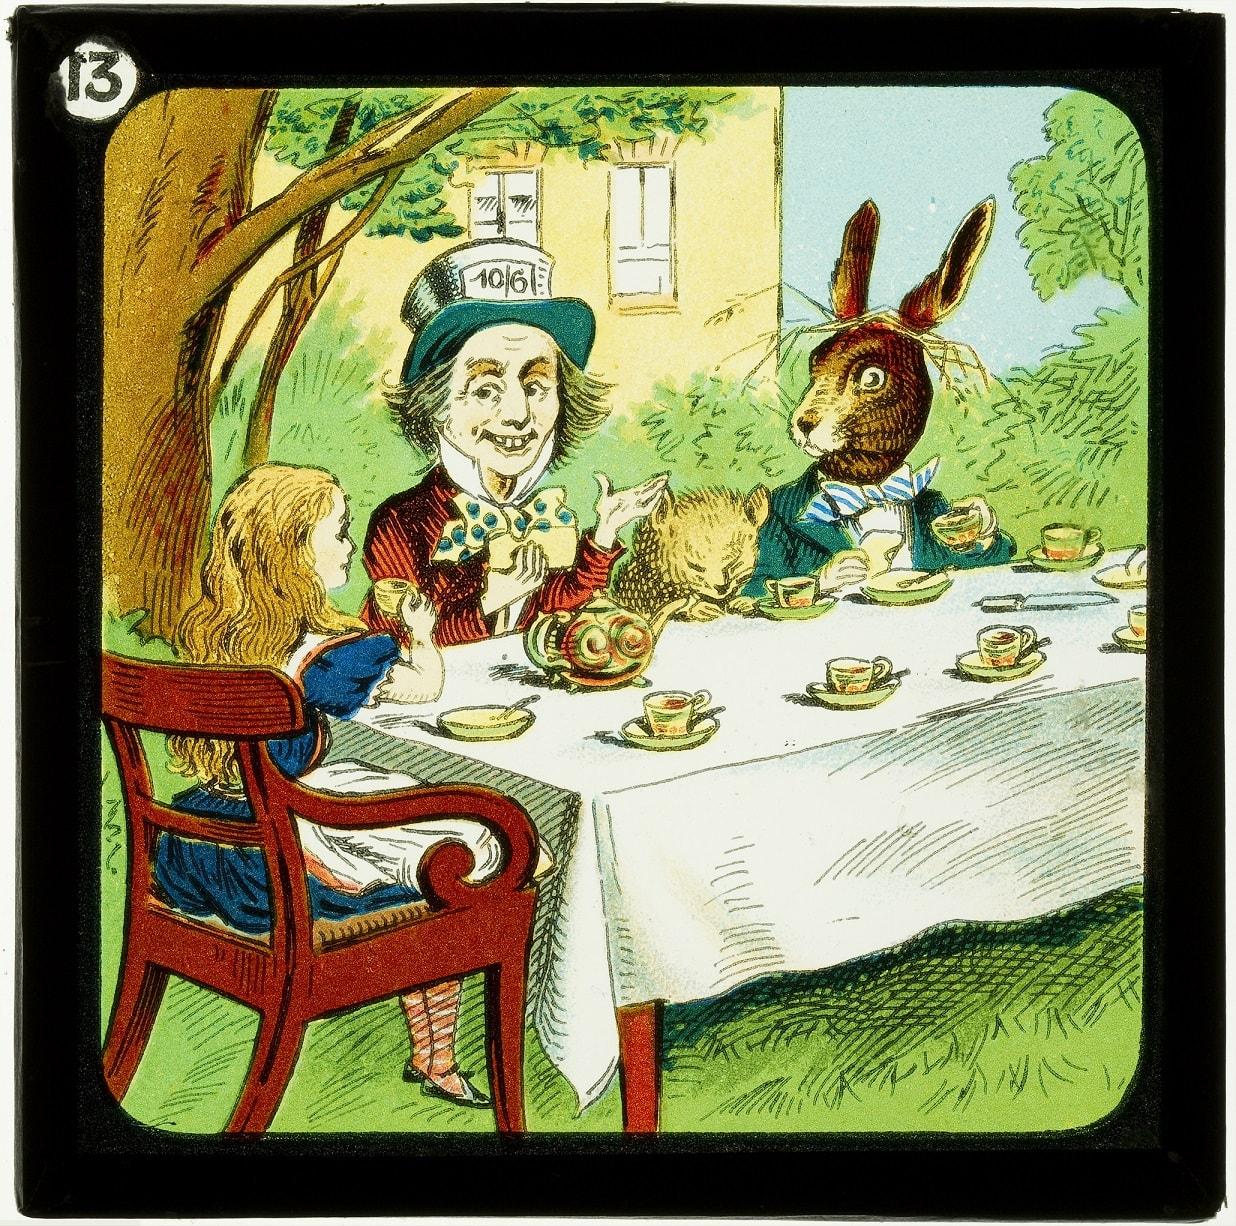 Alice in Wonderland magic lantern slide_1905-08_W Butcher and Sons_3